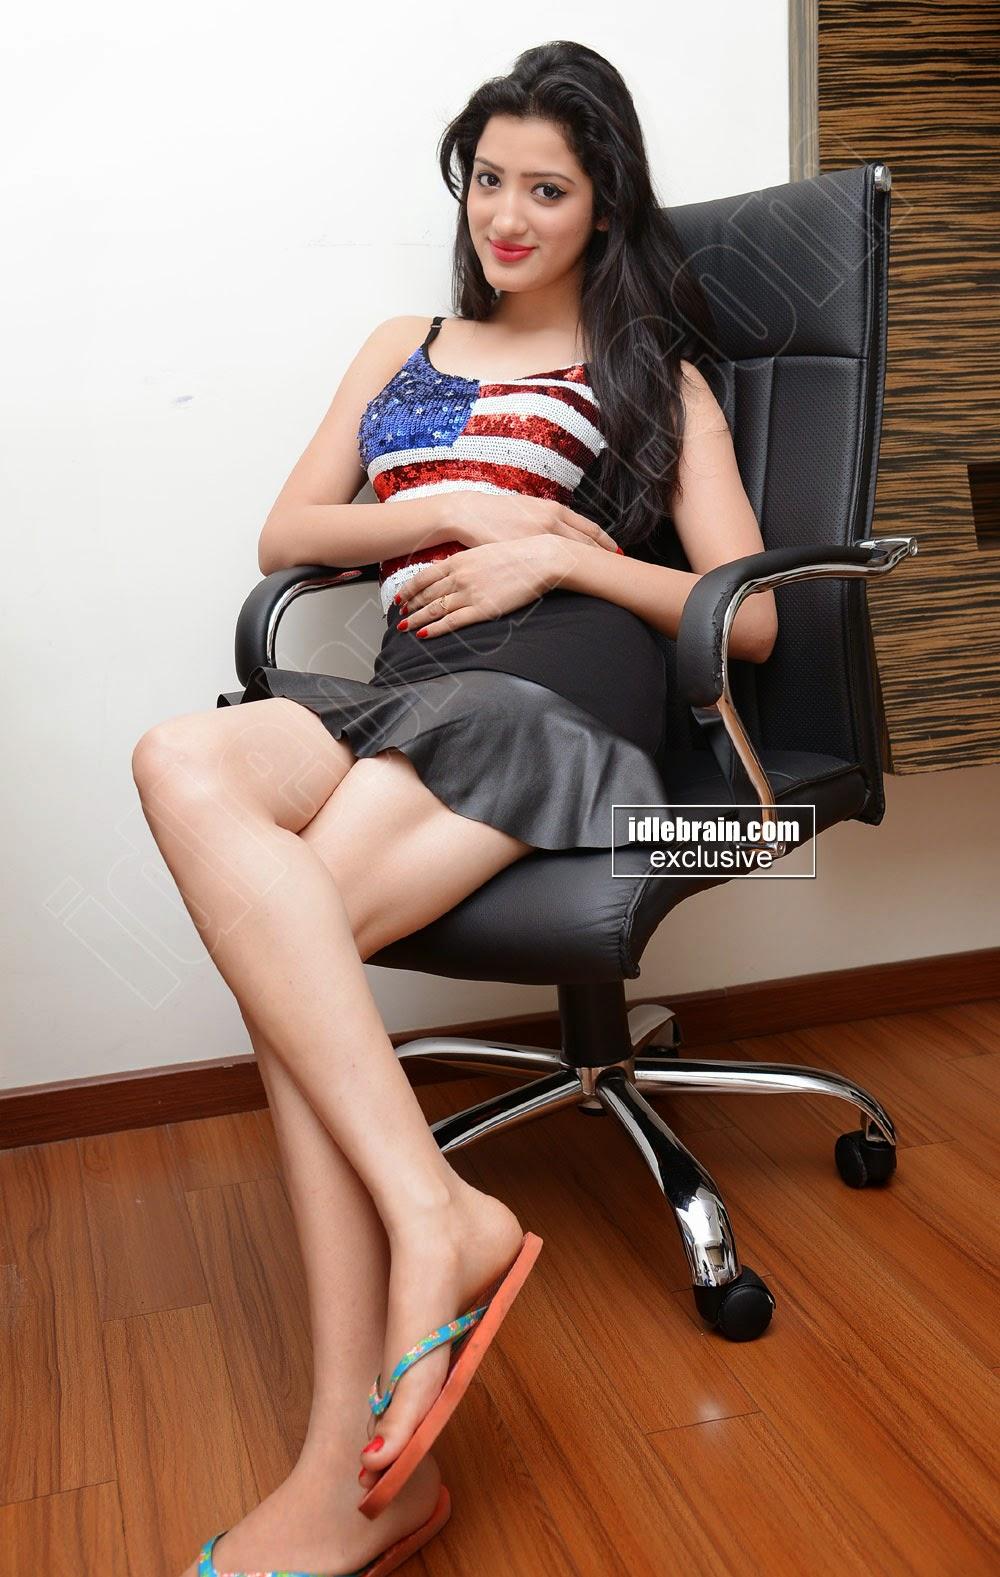 Richa Panai Milk White Beauty Babe In a Black Mini Skirt